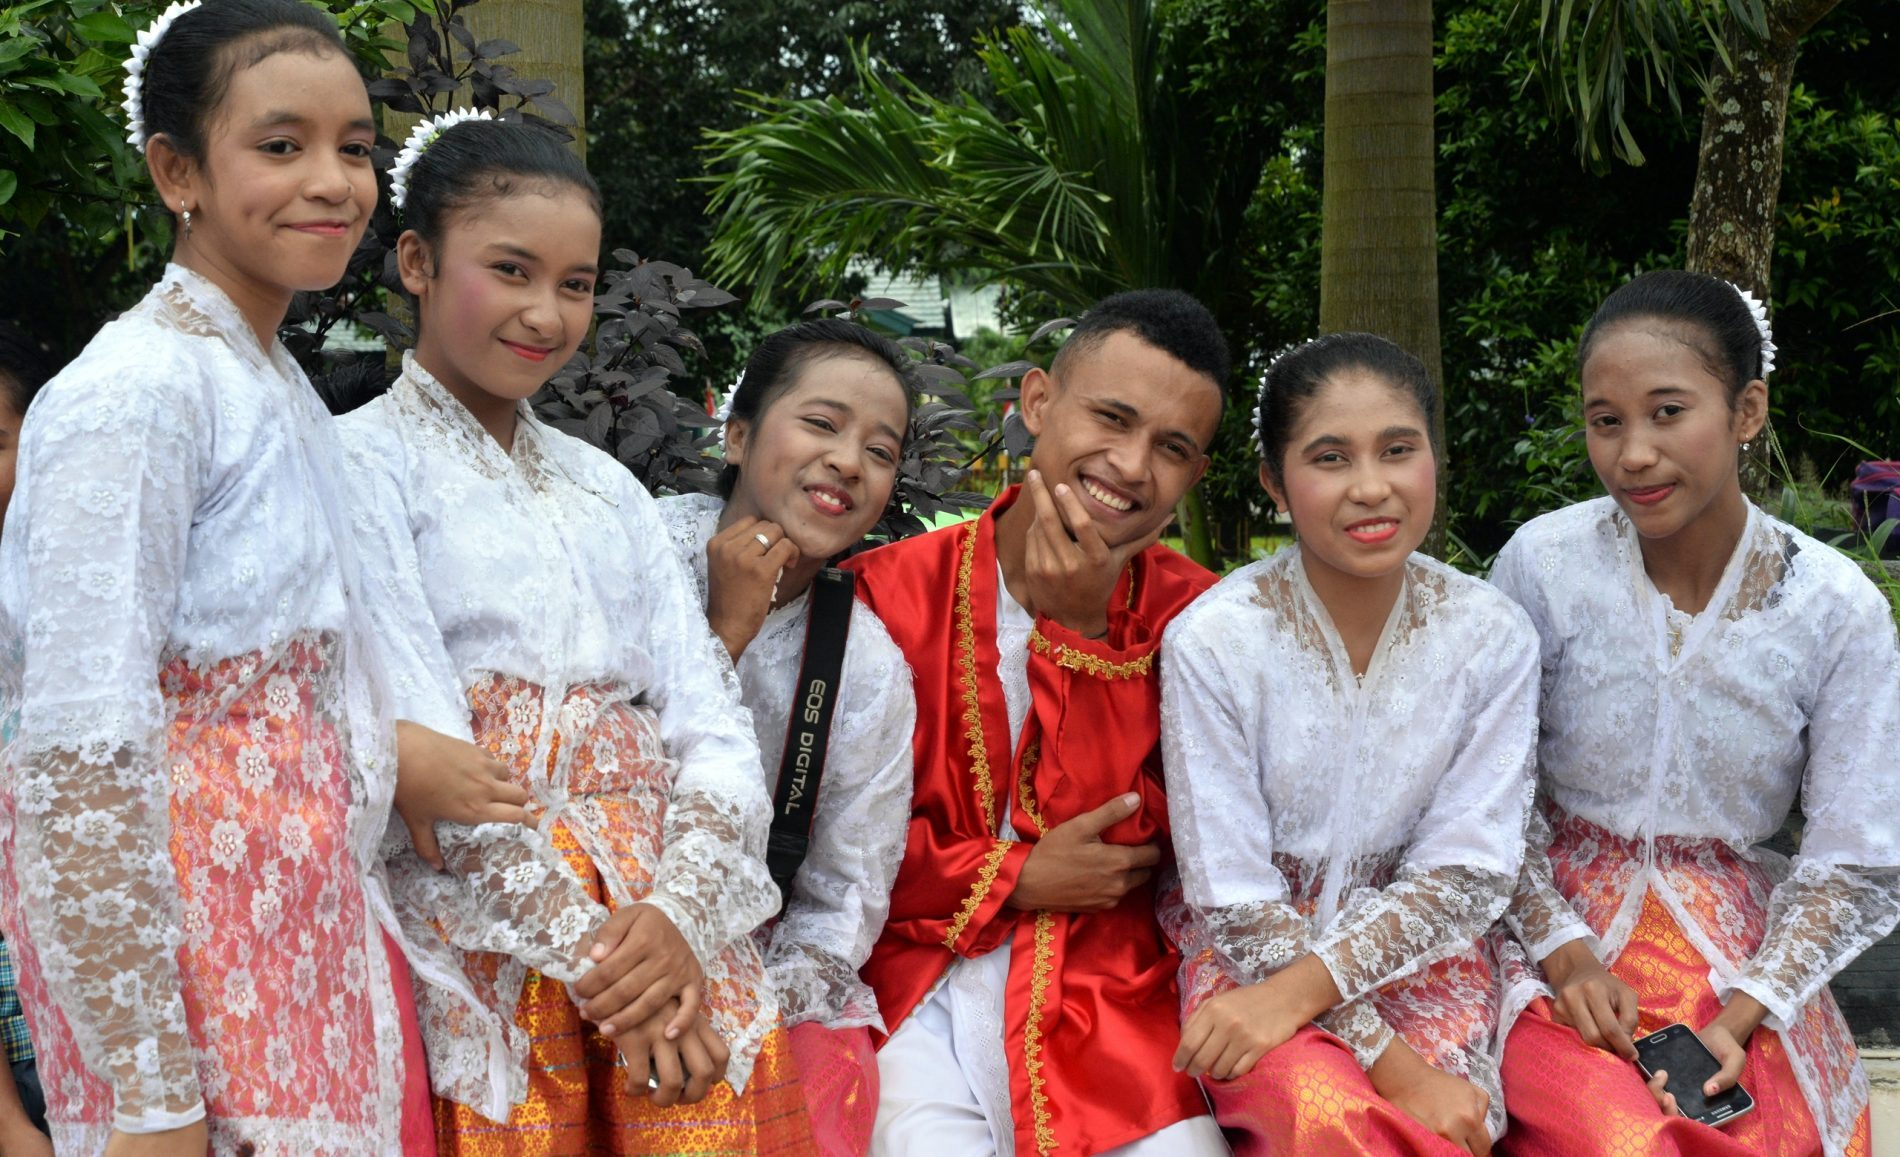 The friendly people of Maluku